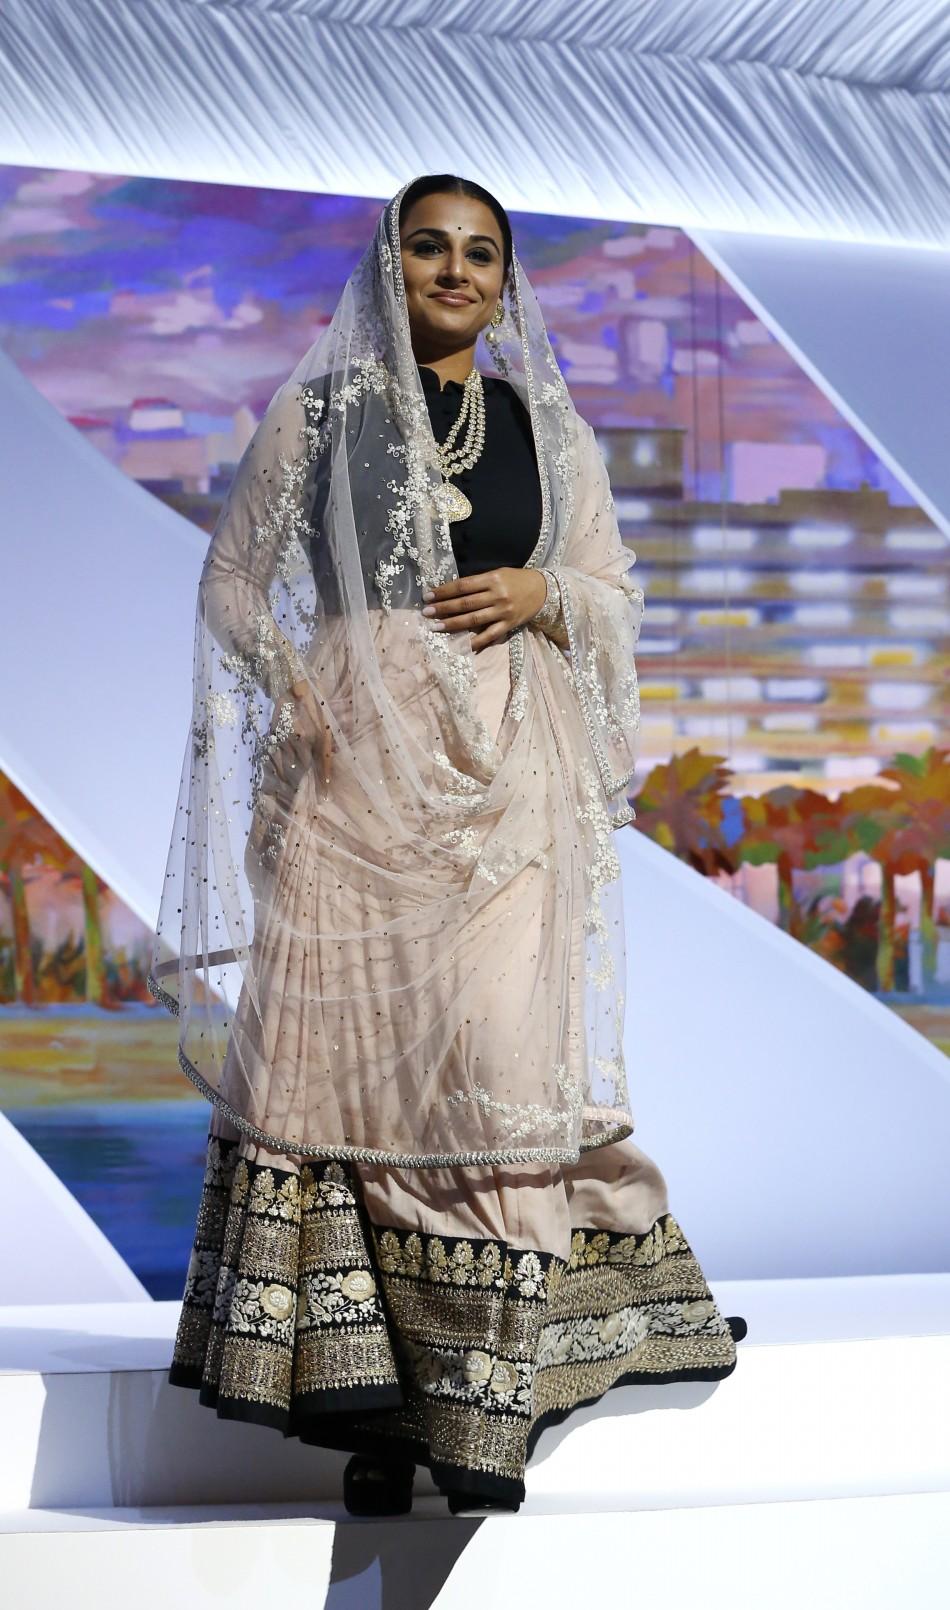 Vidya Balan at Cannes Film Festival 2013 Red Carpet